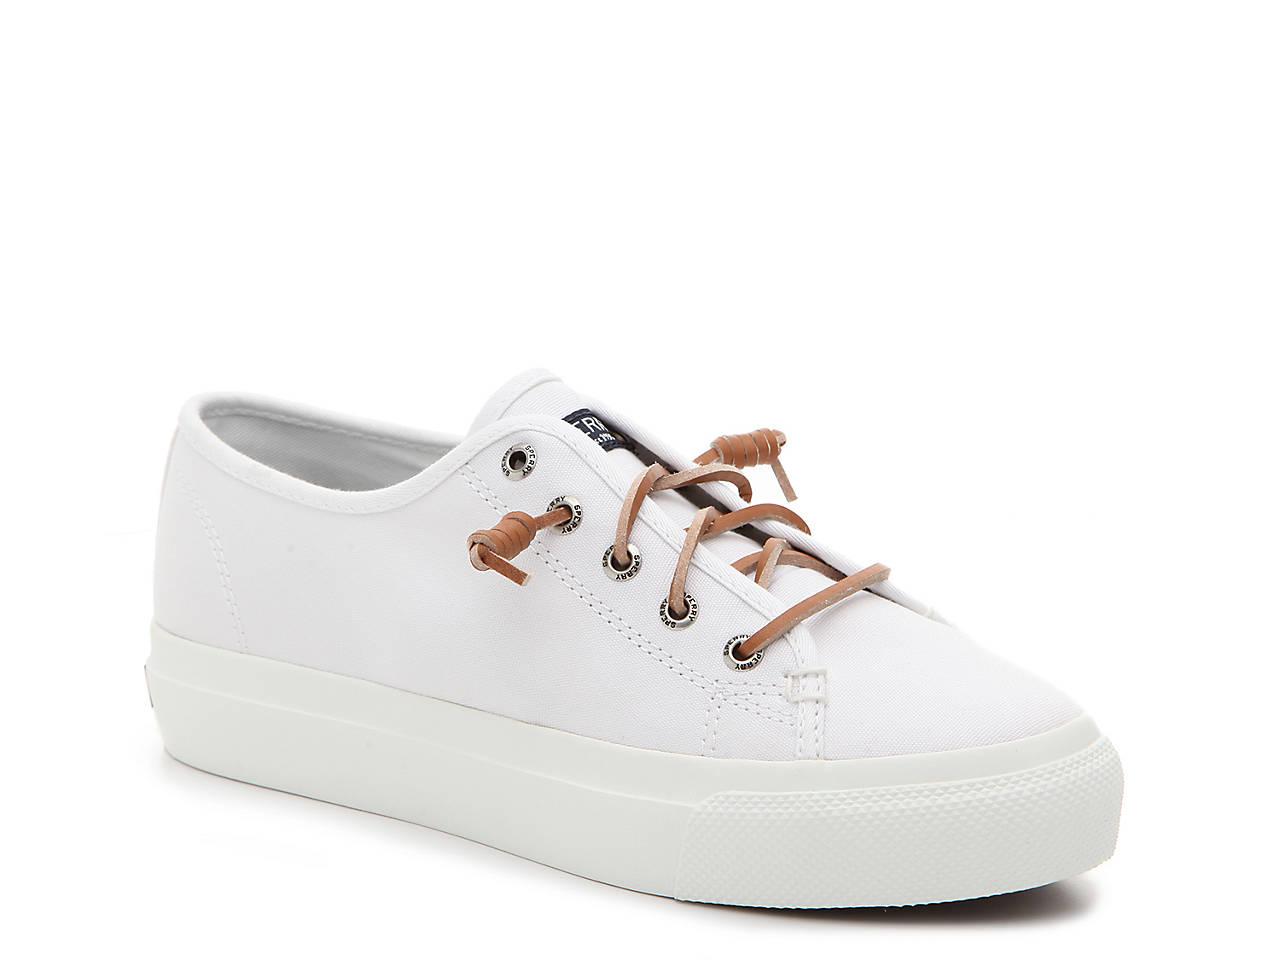 Sperry Top-Sider Cliffside Platform Slip-On Sneaker Women s Shoes  09a463f94